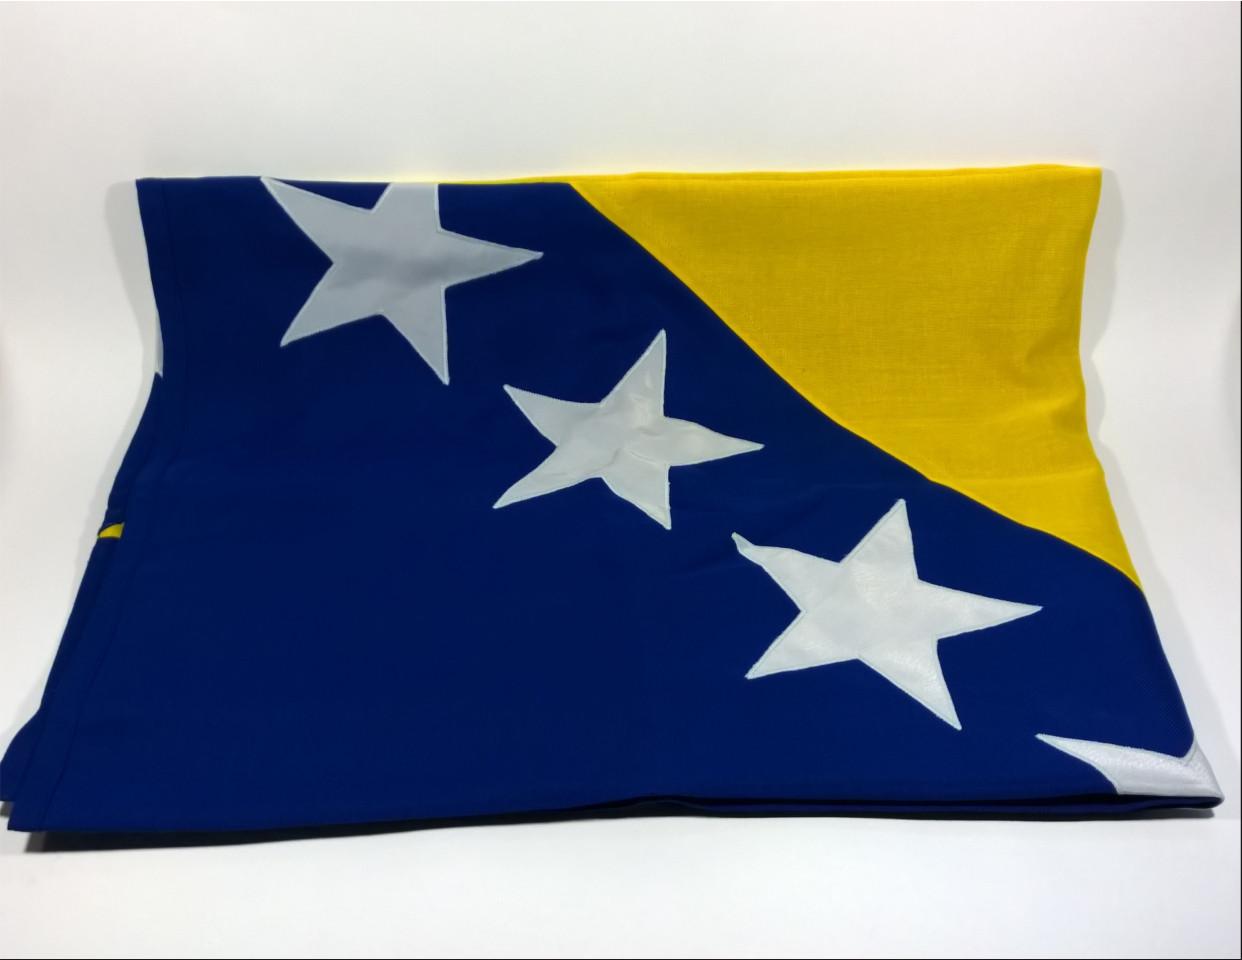 Прапор Боснії та Герцеговини (Аплікація) - 1м*1.5м